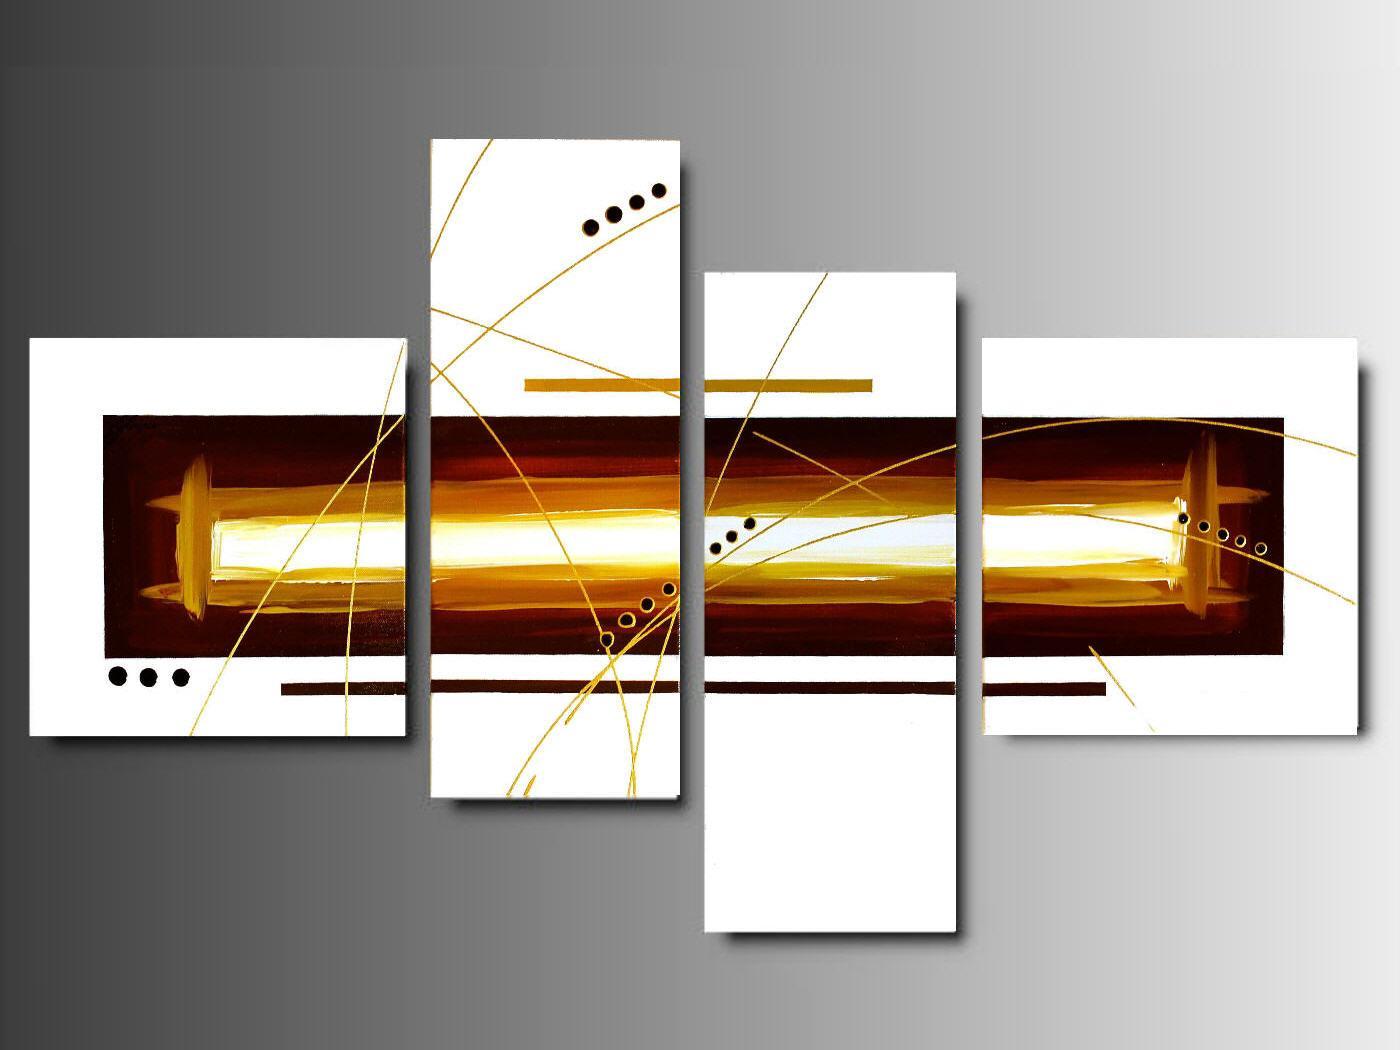 Lampadario vetro moderno led 4000k - Dalani quadri classici ...